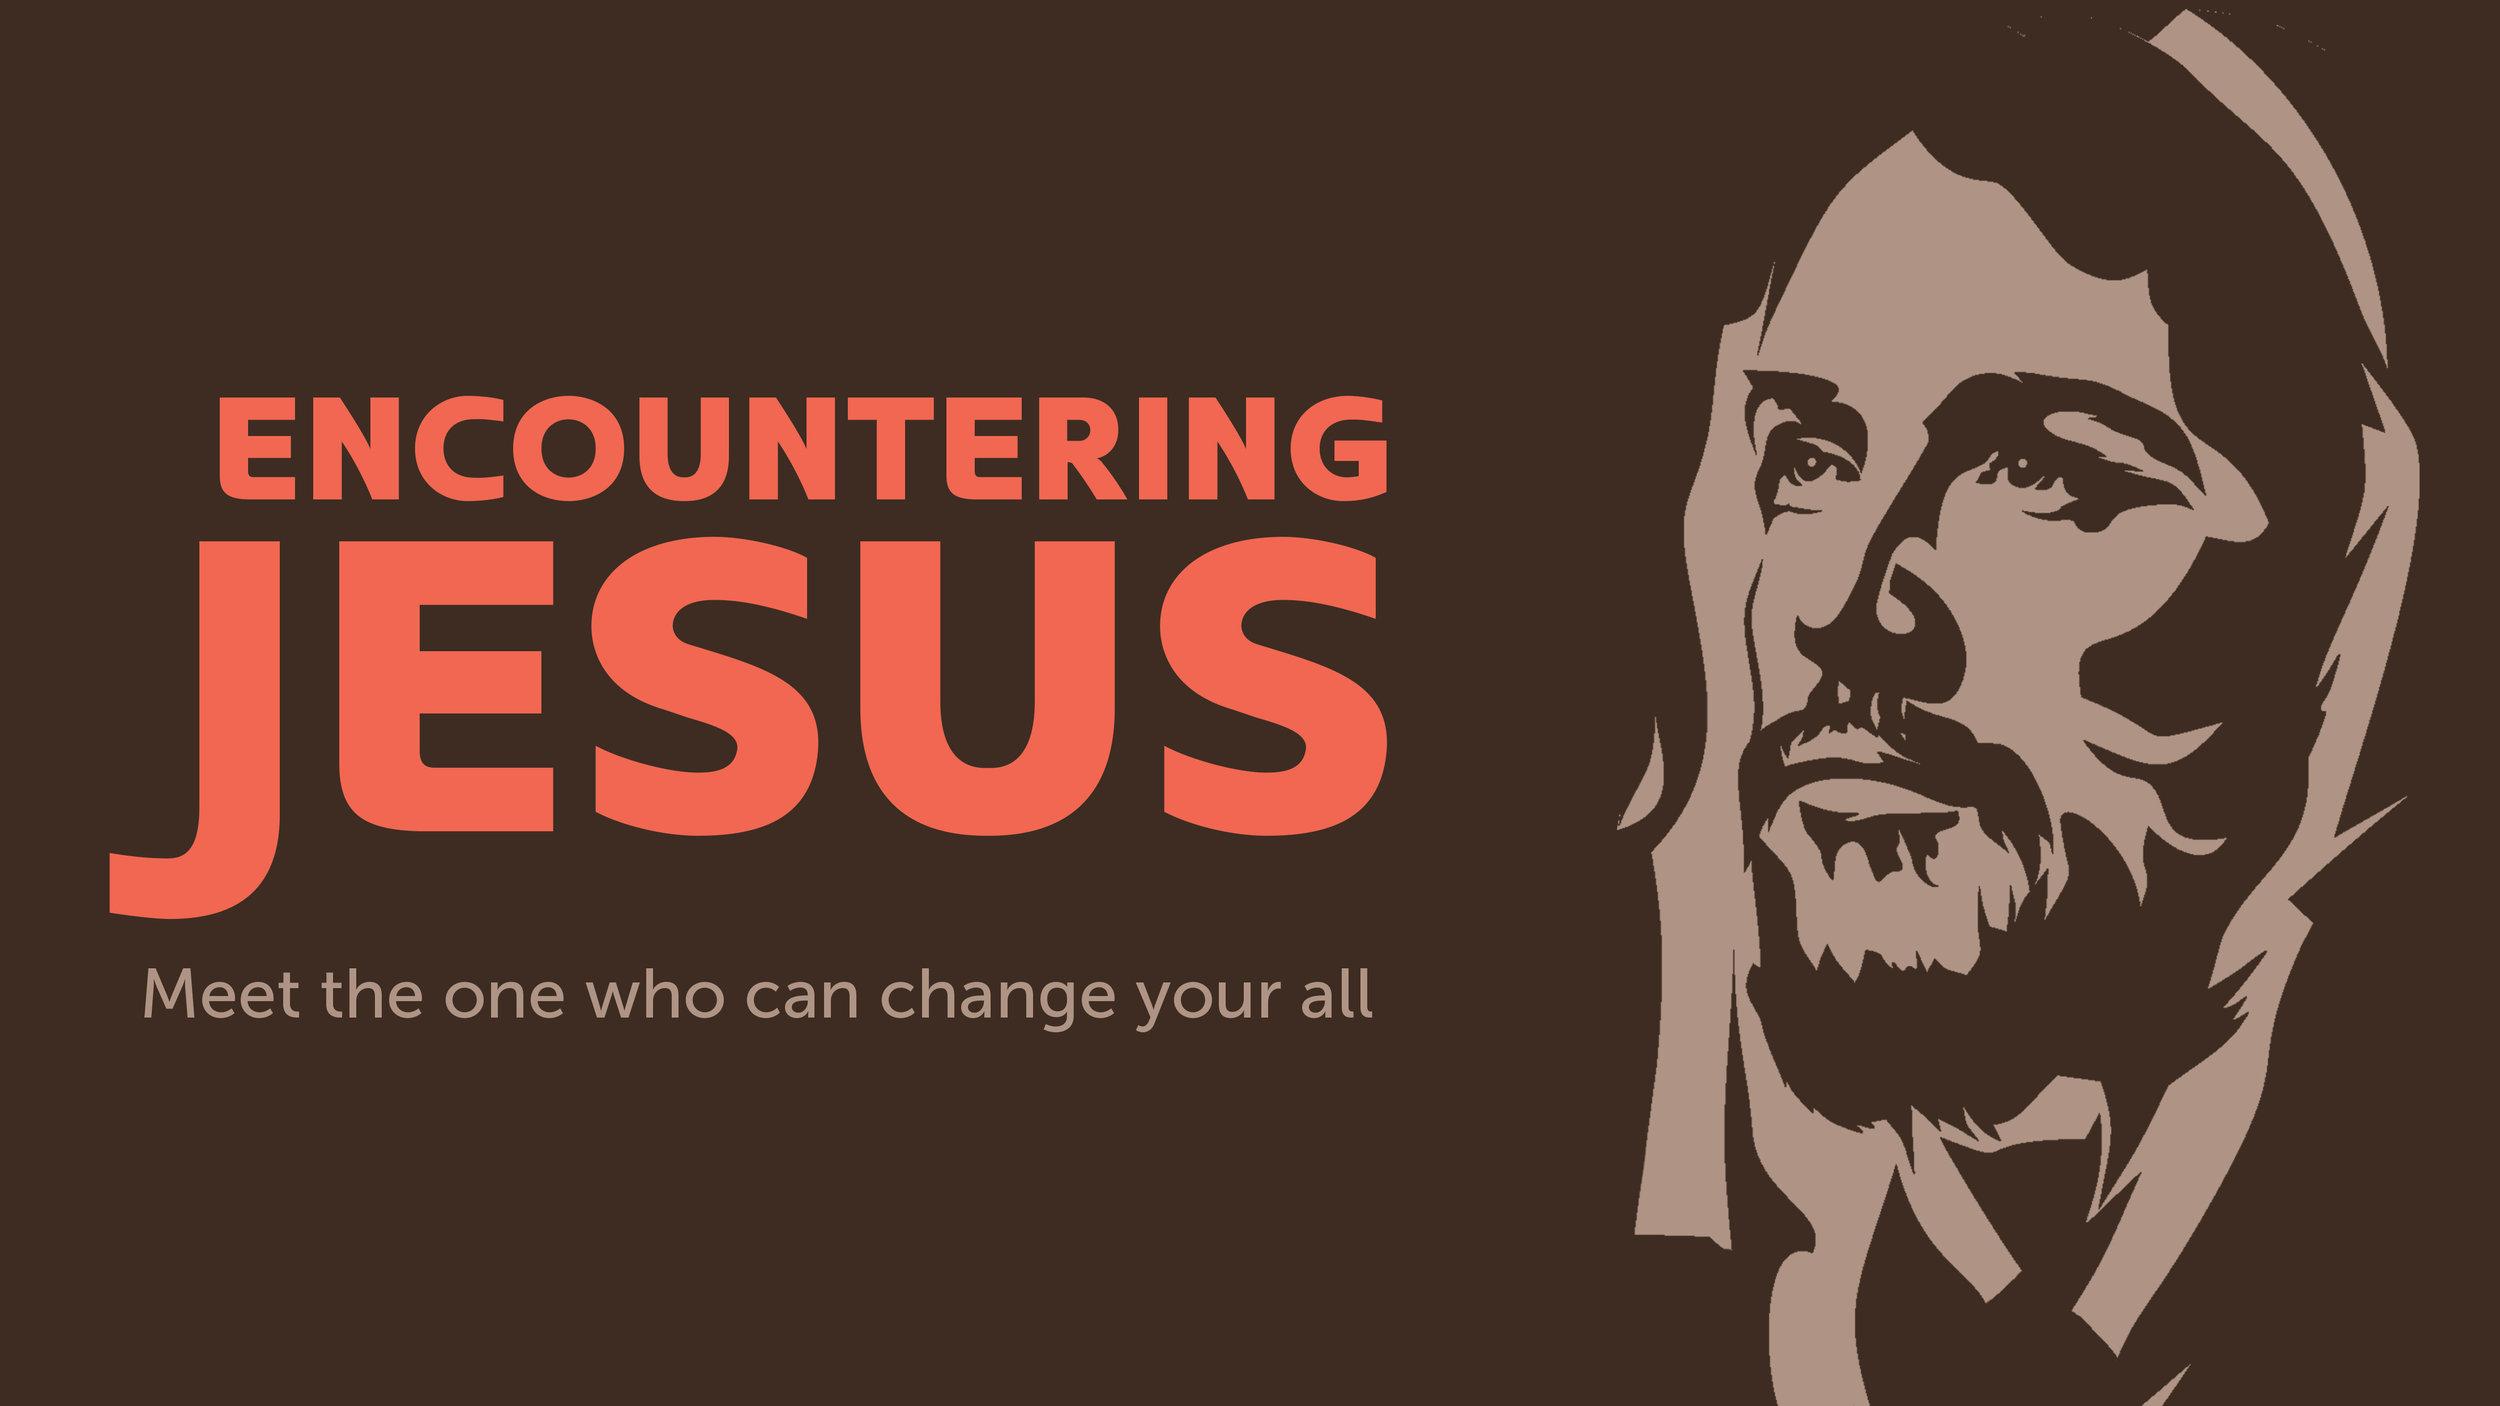 Encountering Jesus 16x9.jpg